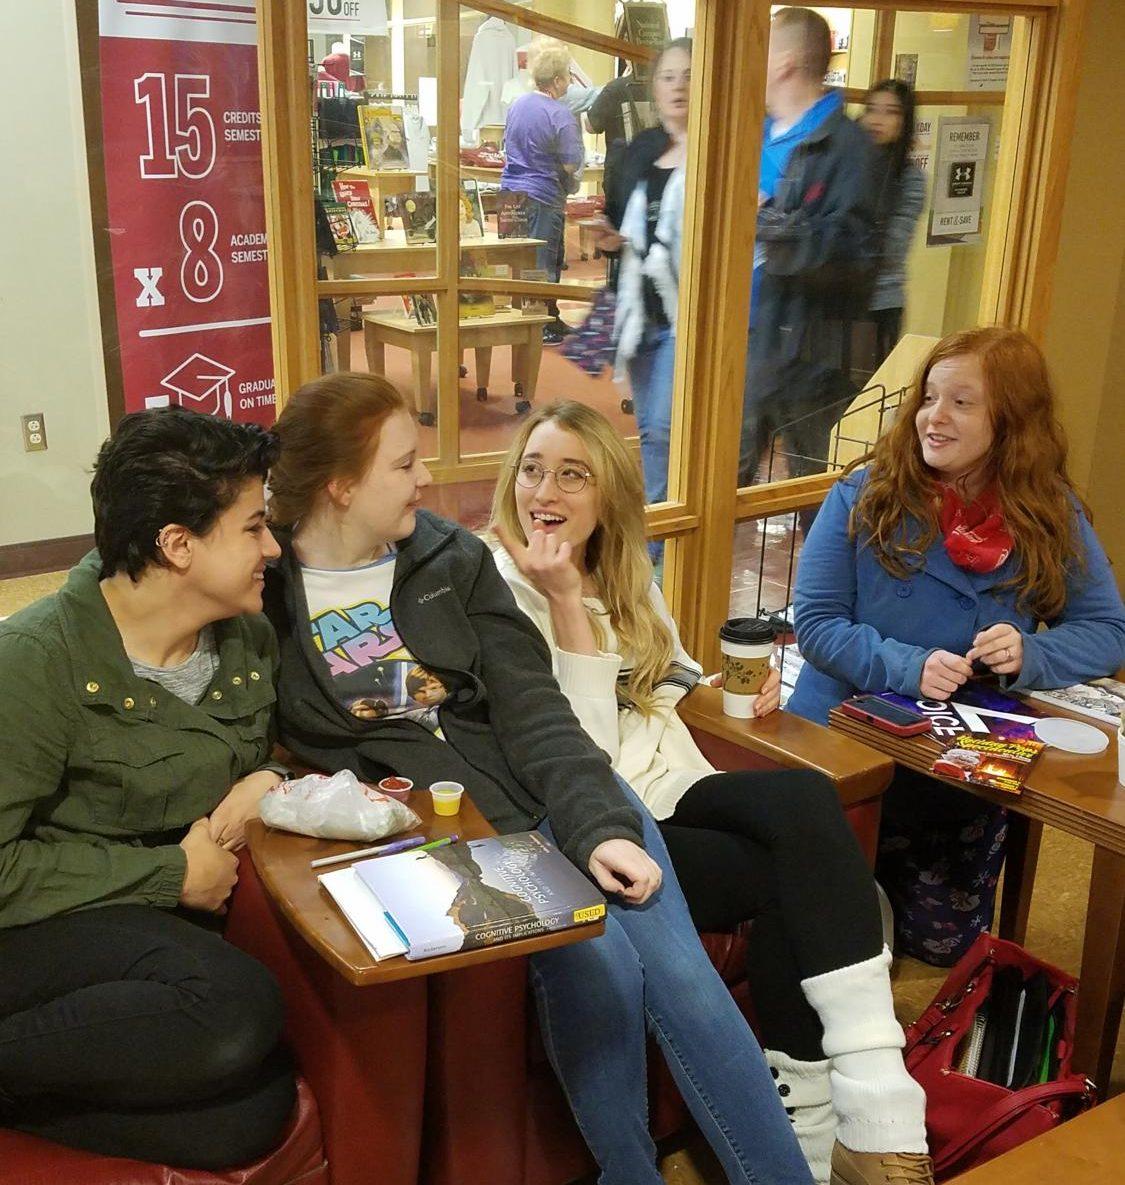 Megan Randall [far right] said,